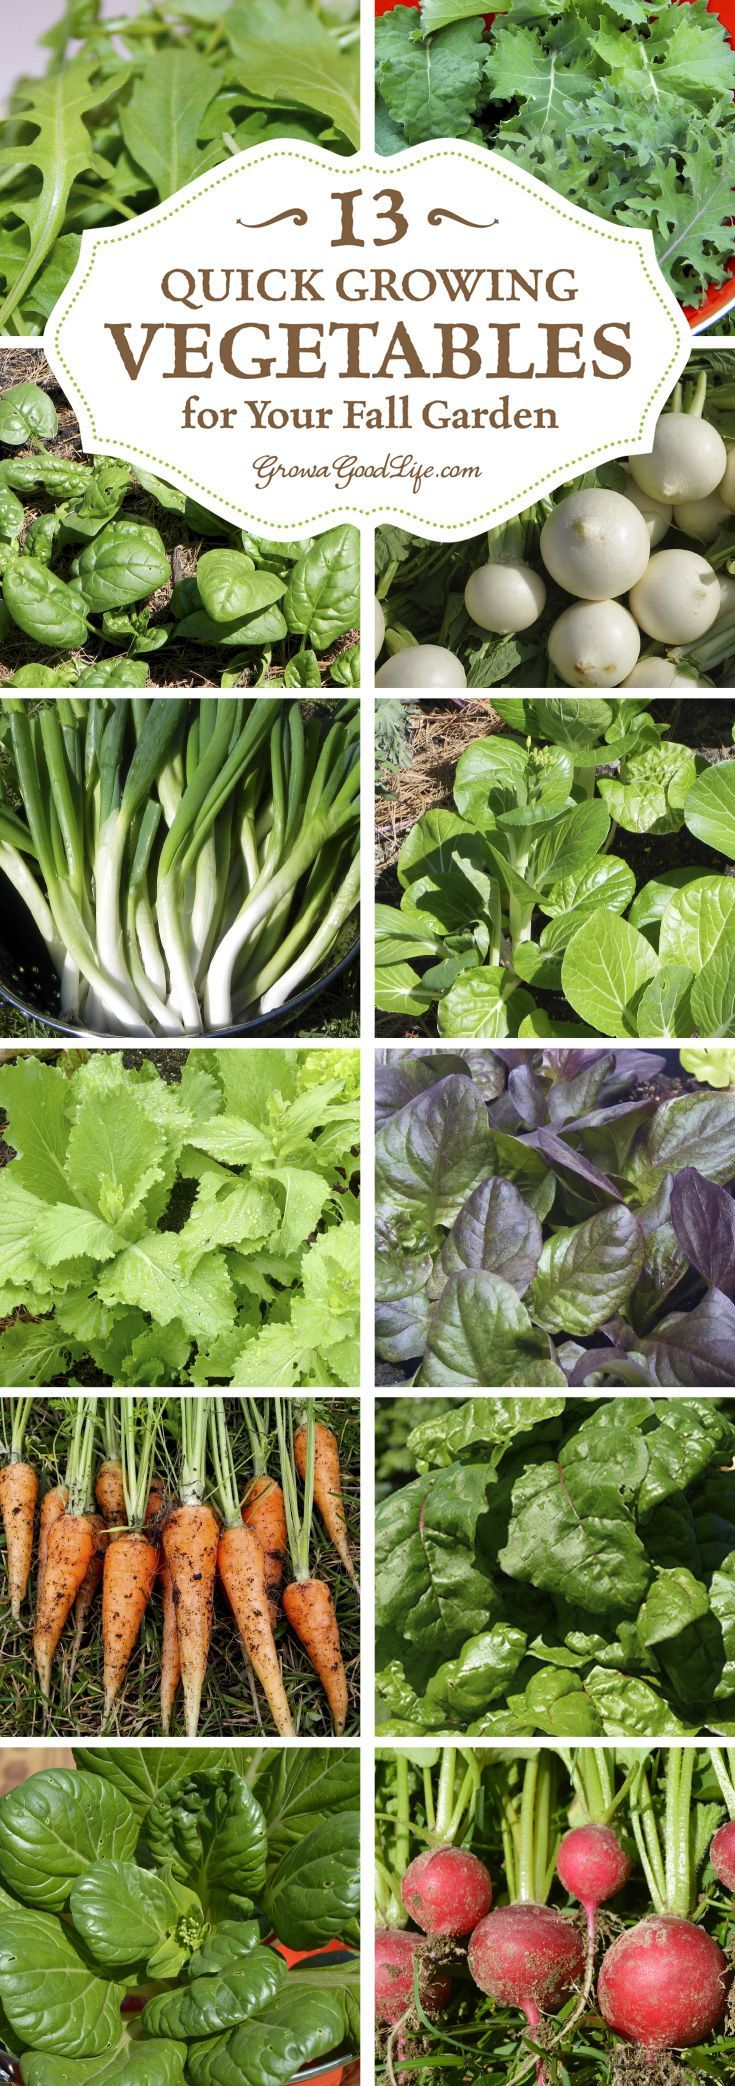 17 Best Images About Organic Garden On Pinterest 400 x 300